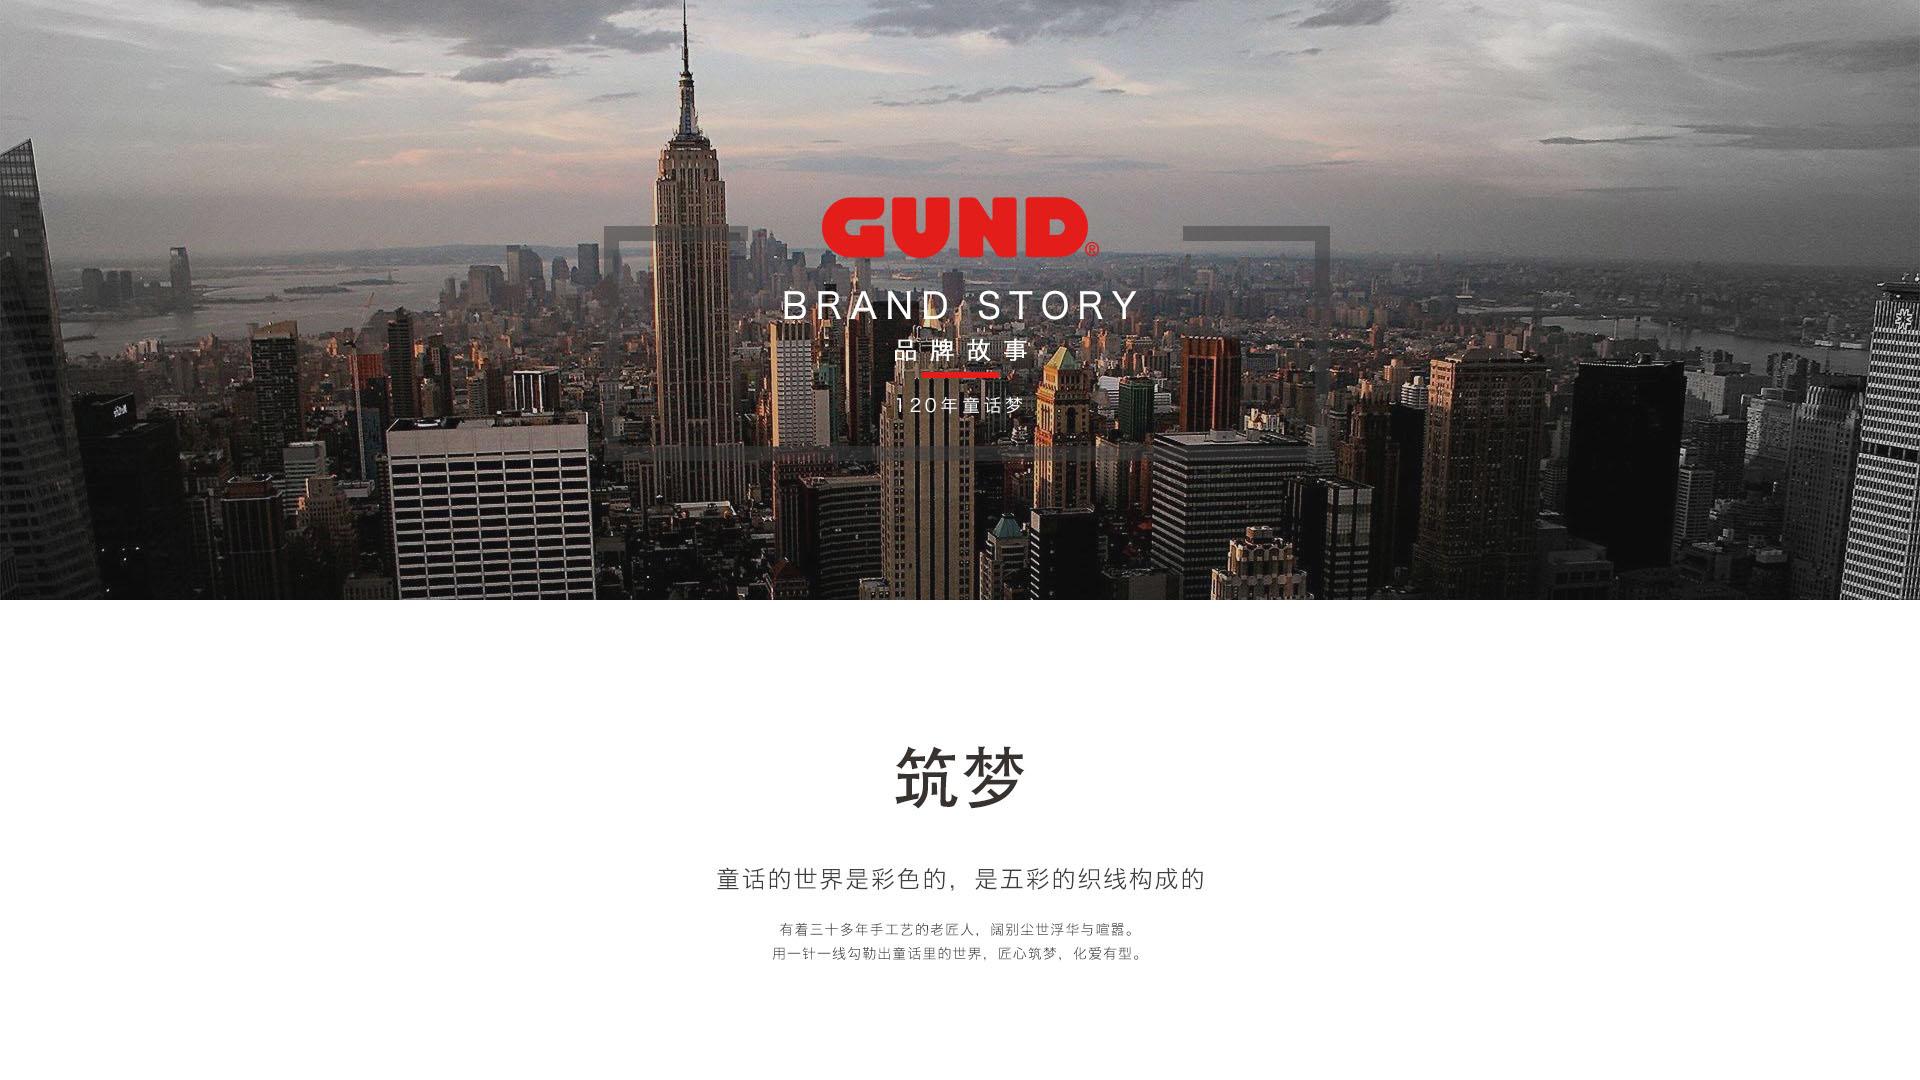 gund品牌故事1.jpg